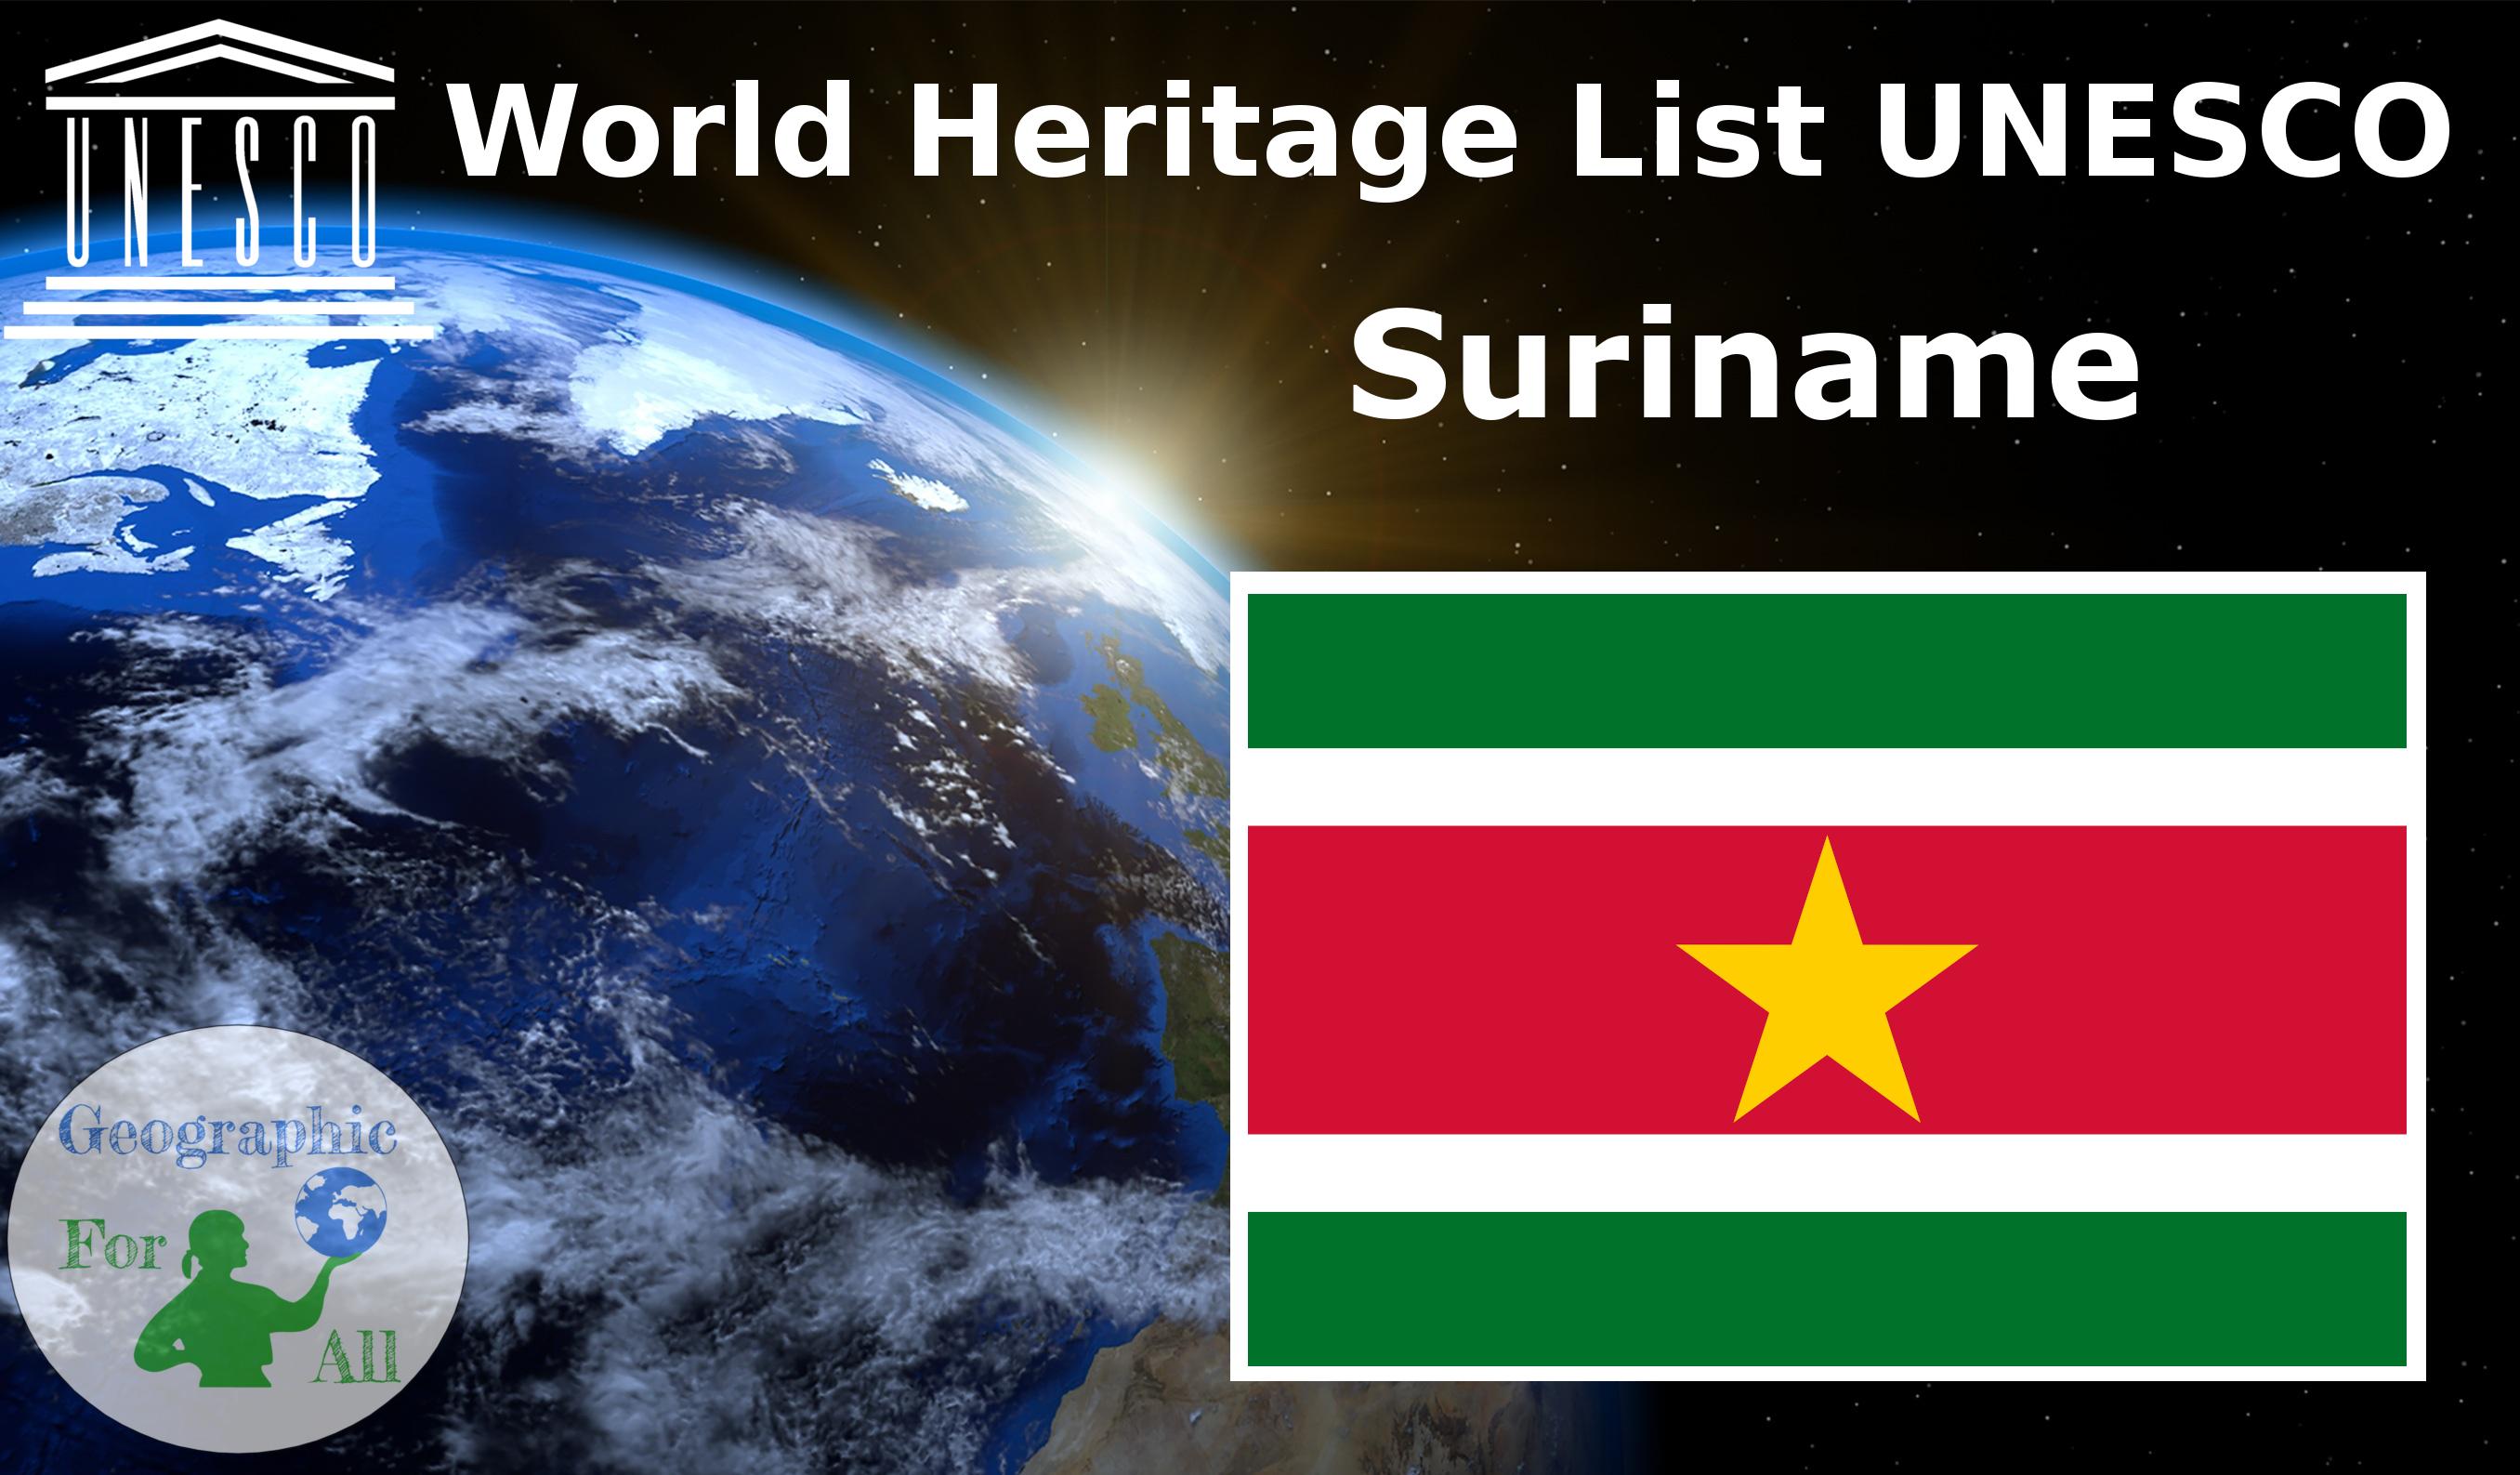 World Heritage List UNESCO - Suriname